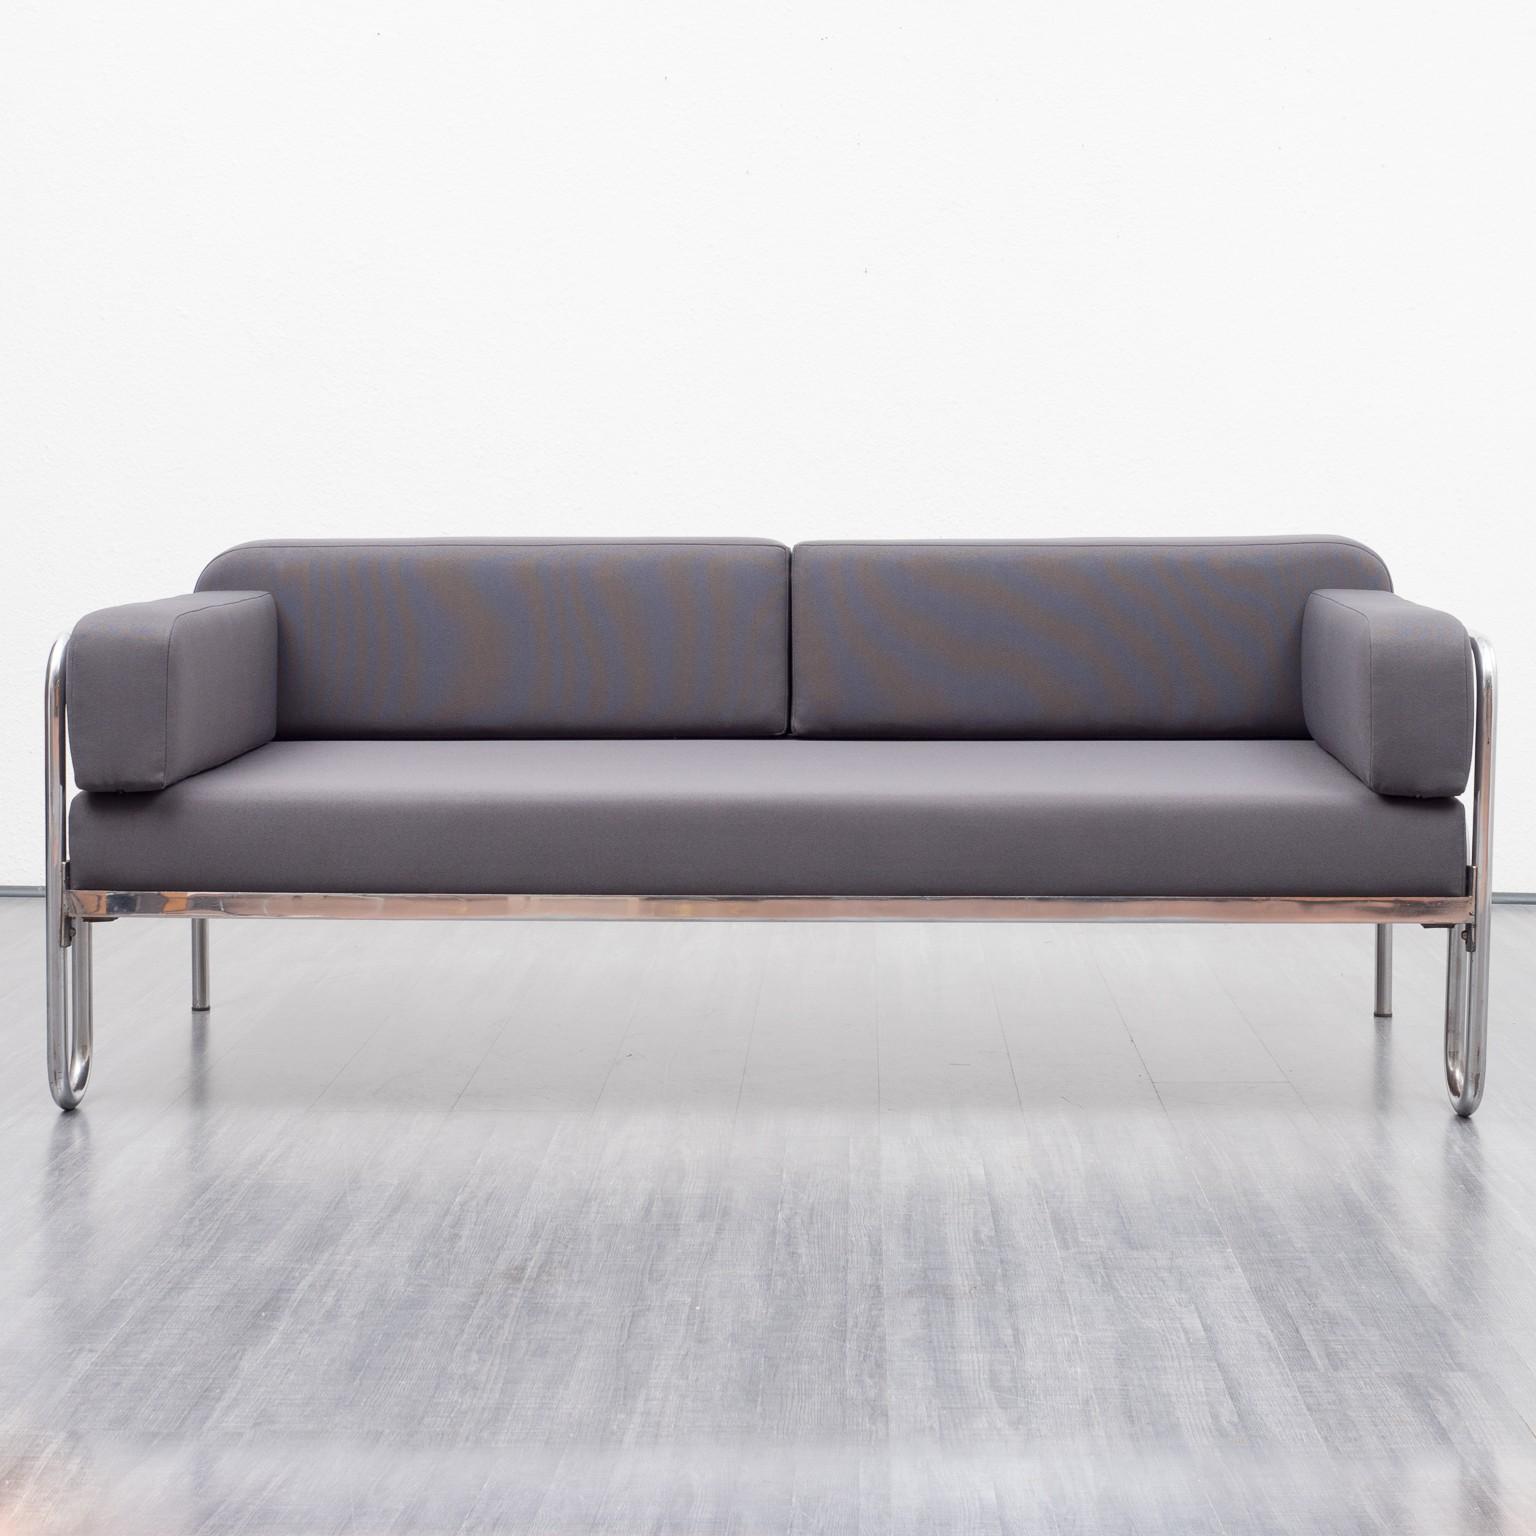 Bauhaus Sofa Vintage New Upholstery 1930s Design Market